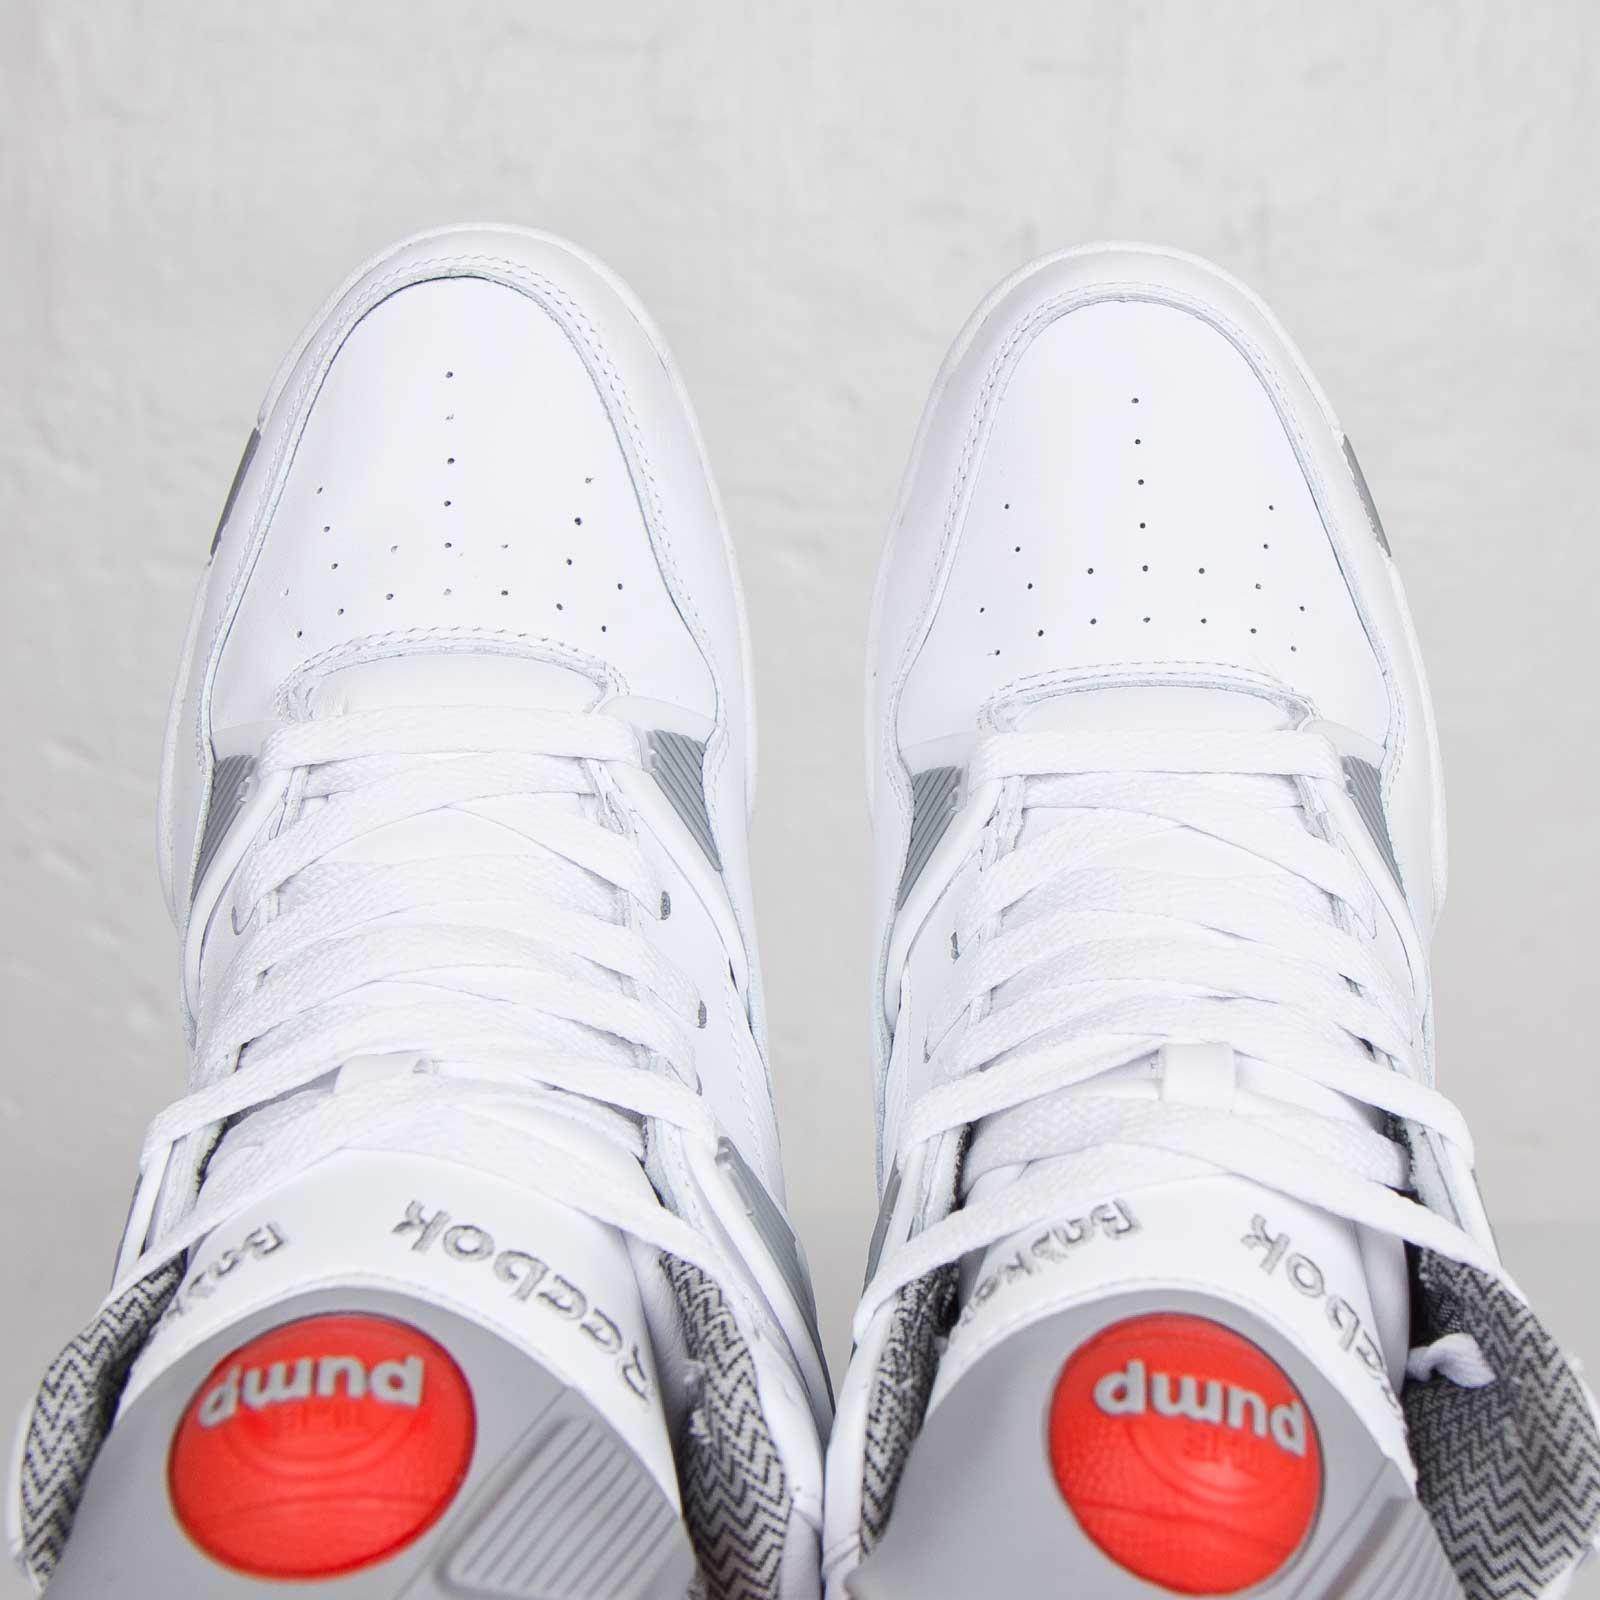 Reebok Pump Omni Zone - J19440 - Sneakersnstuff  8415ce76b